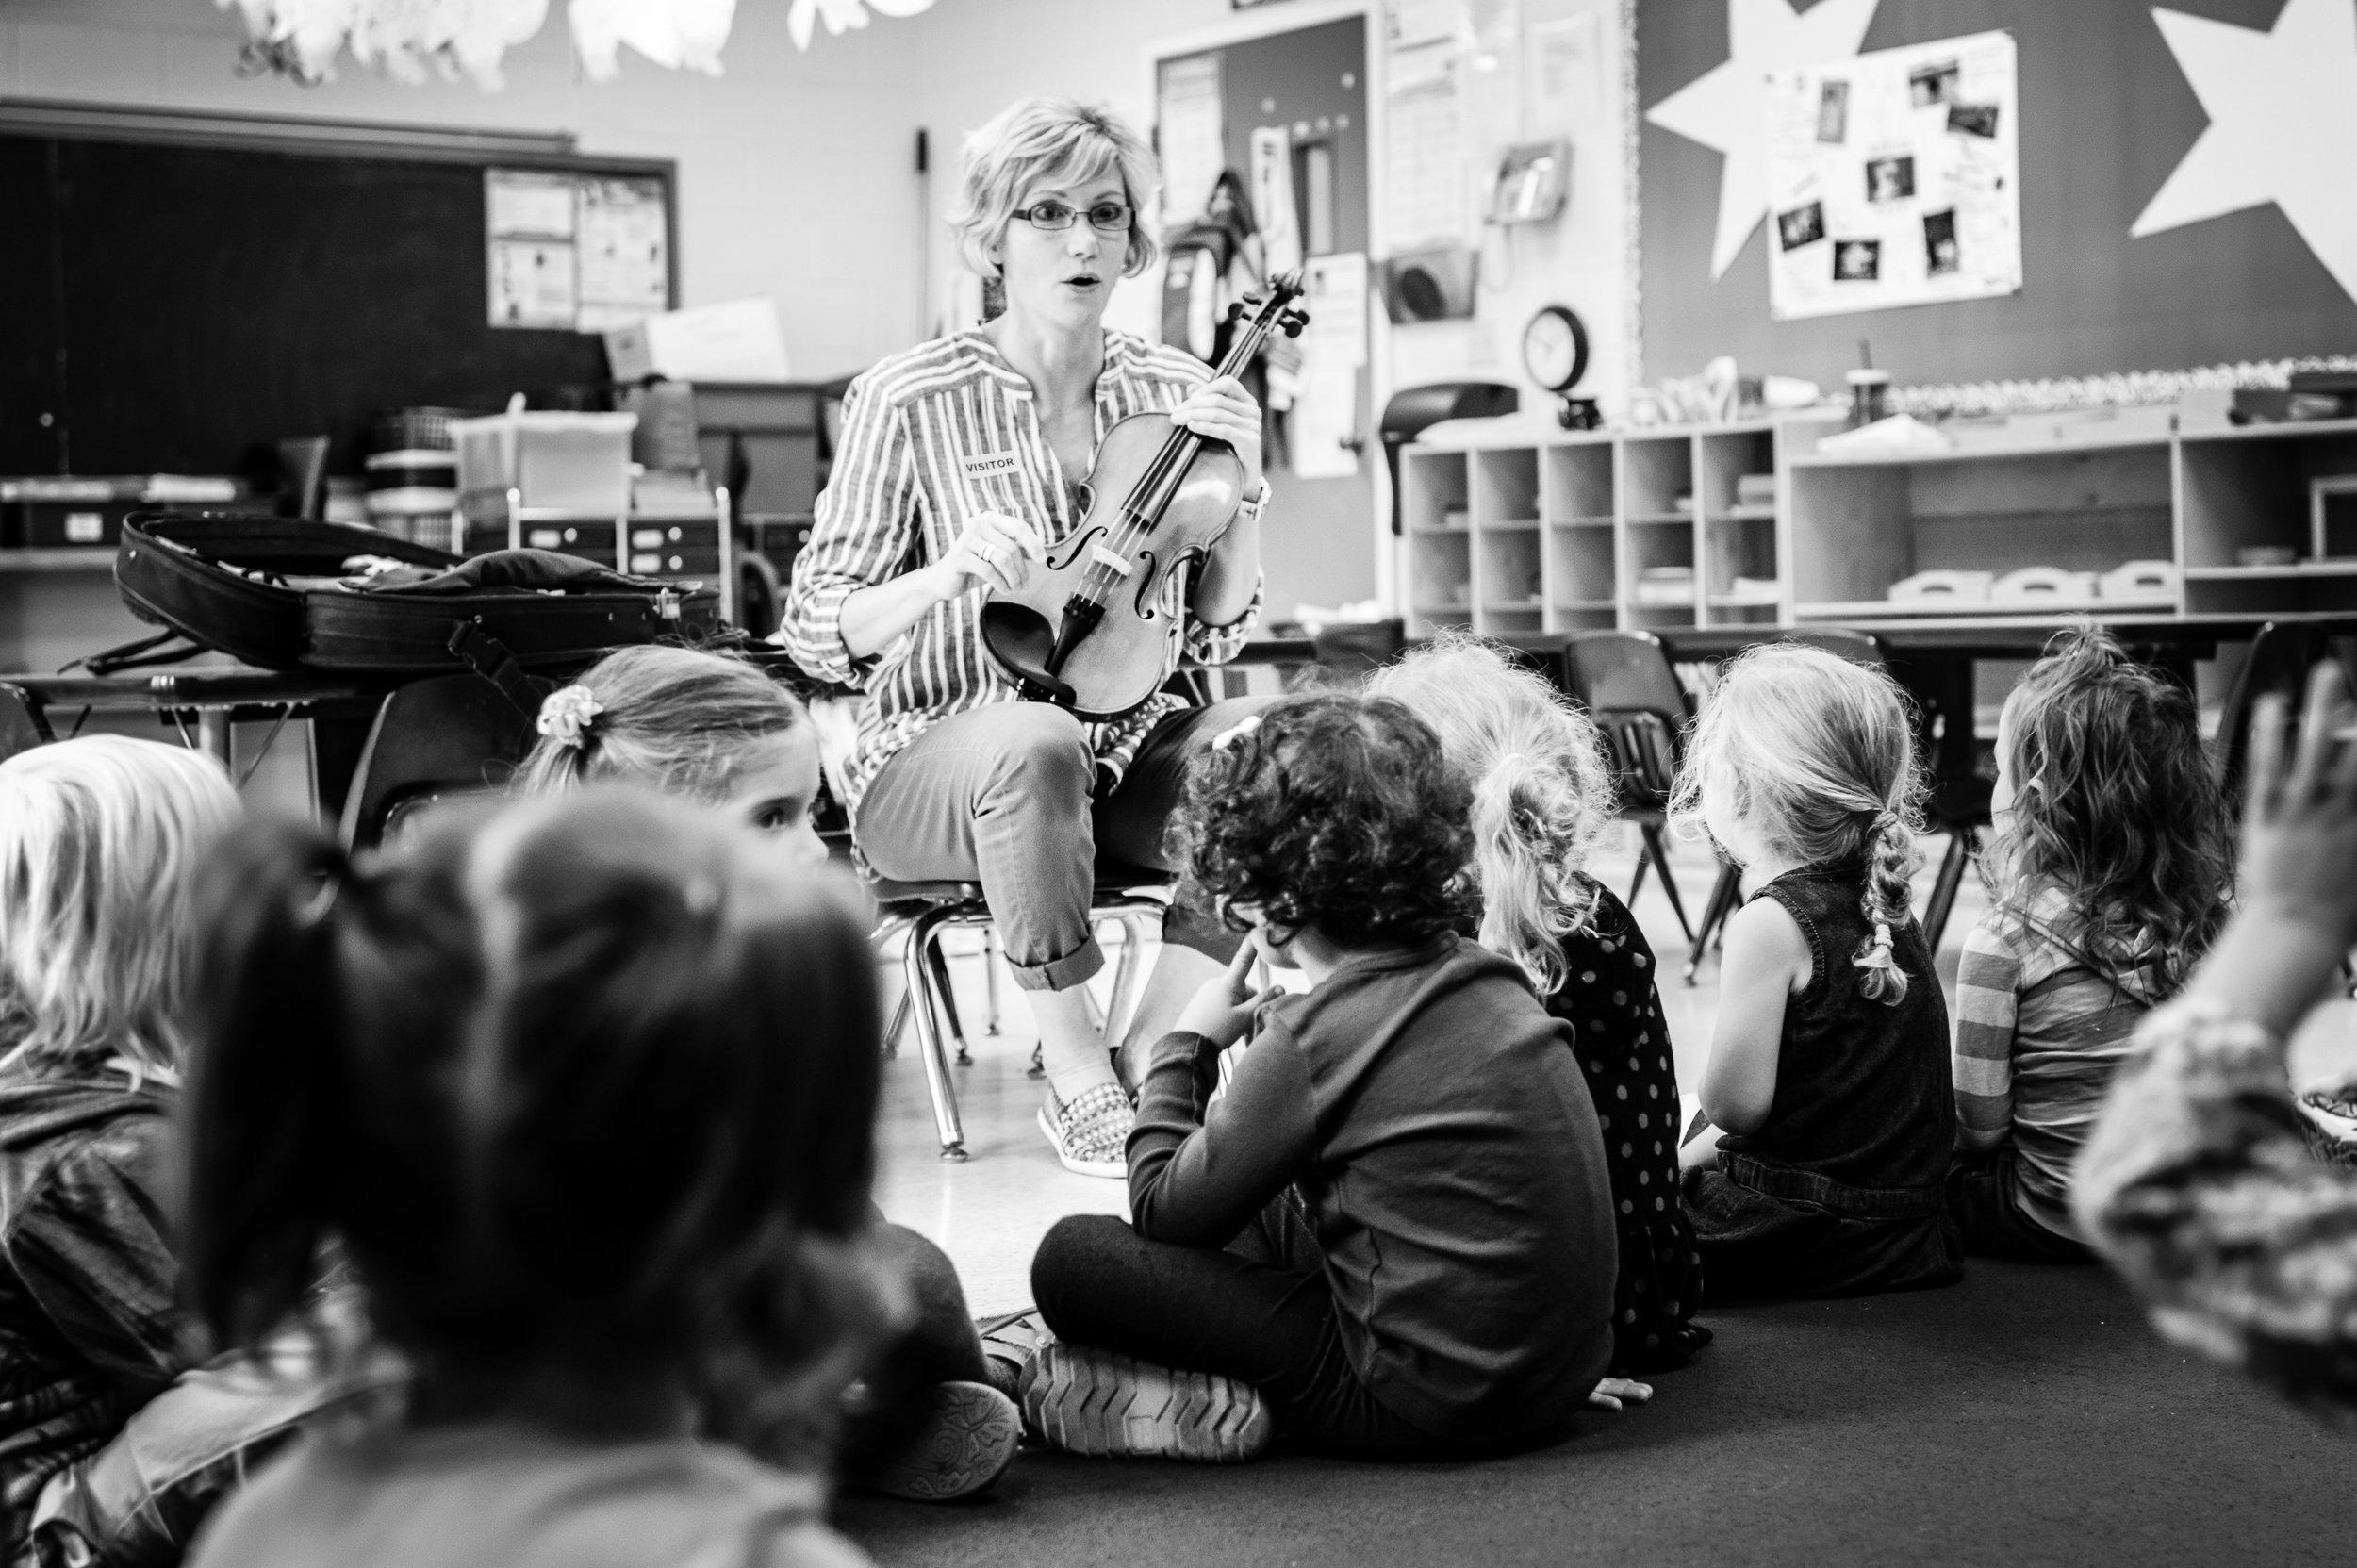 documentary school photography viara mileva kingston toronto ottawa-163444vm.jpg